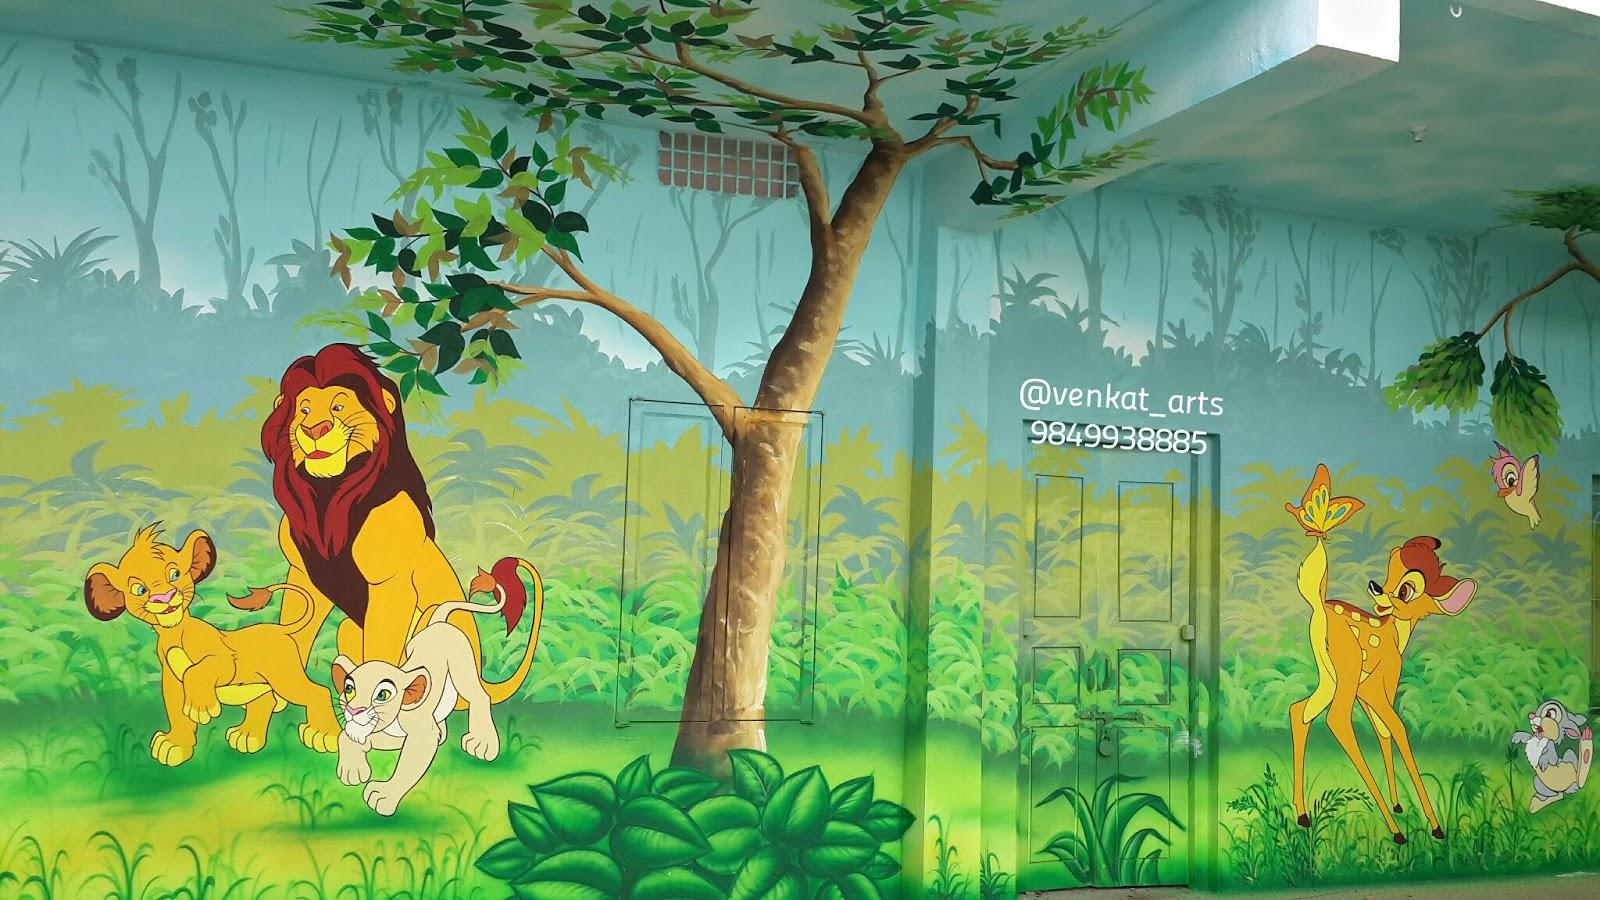 Play School Wall Painting Gadapa Muggu Designs By Venkat Arts